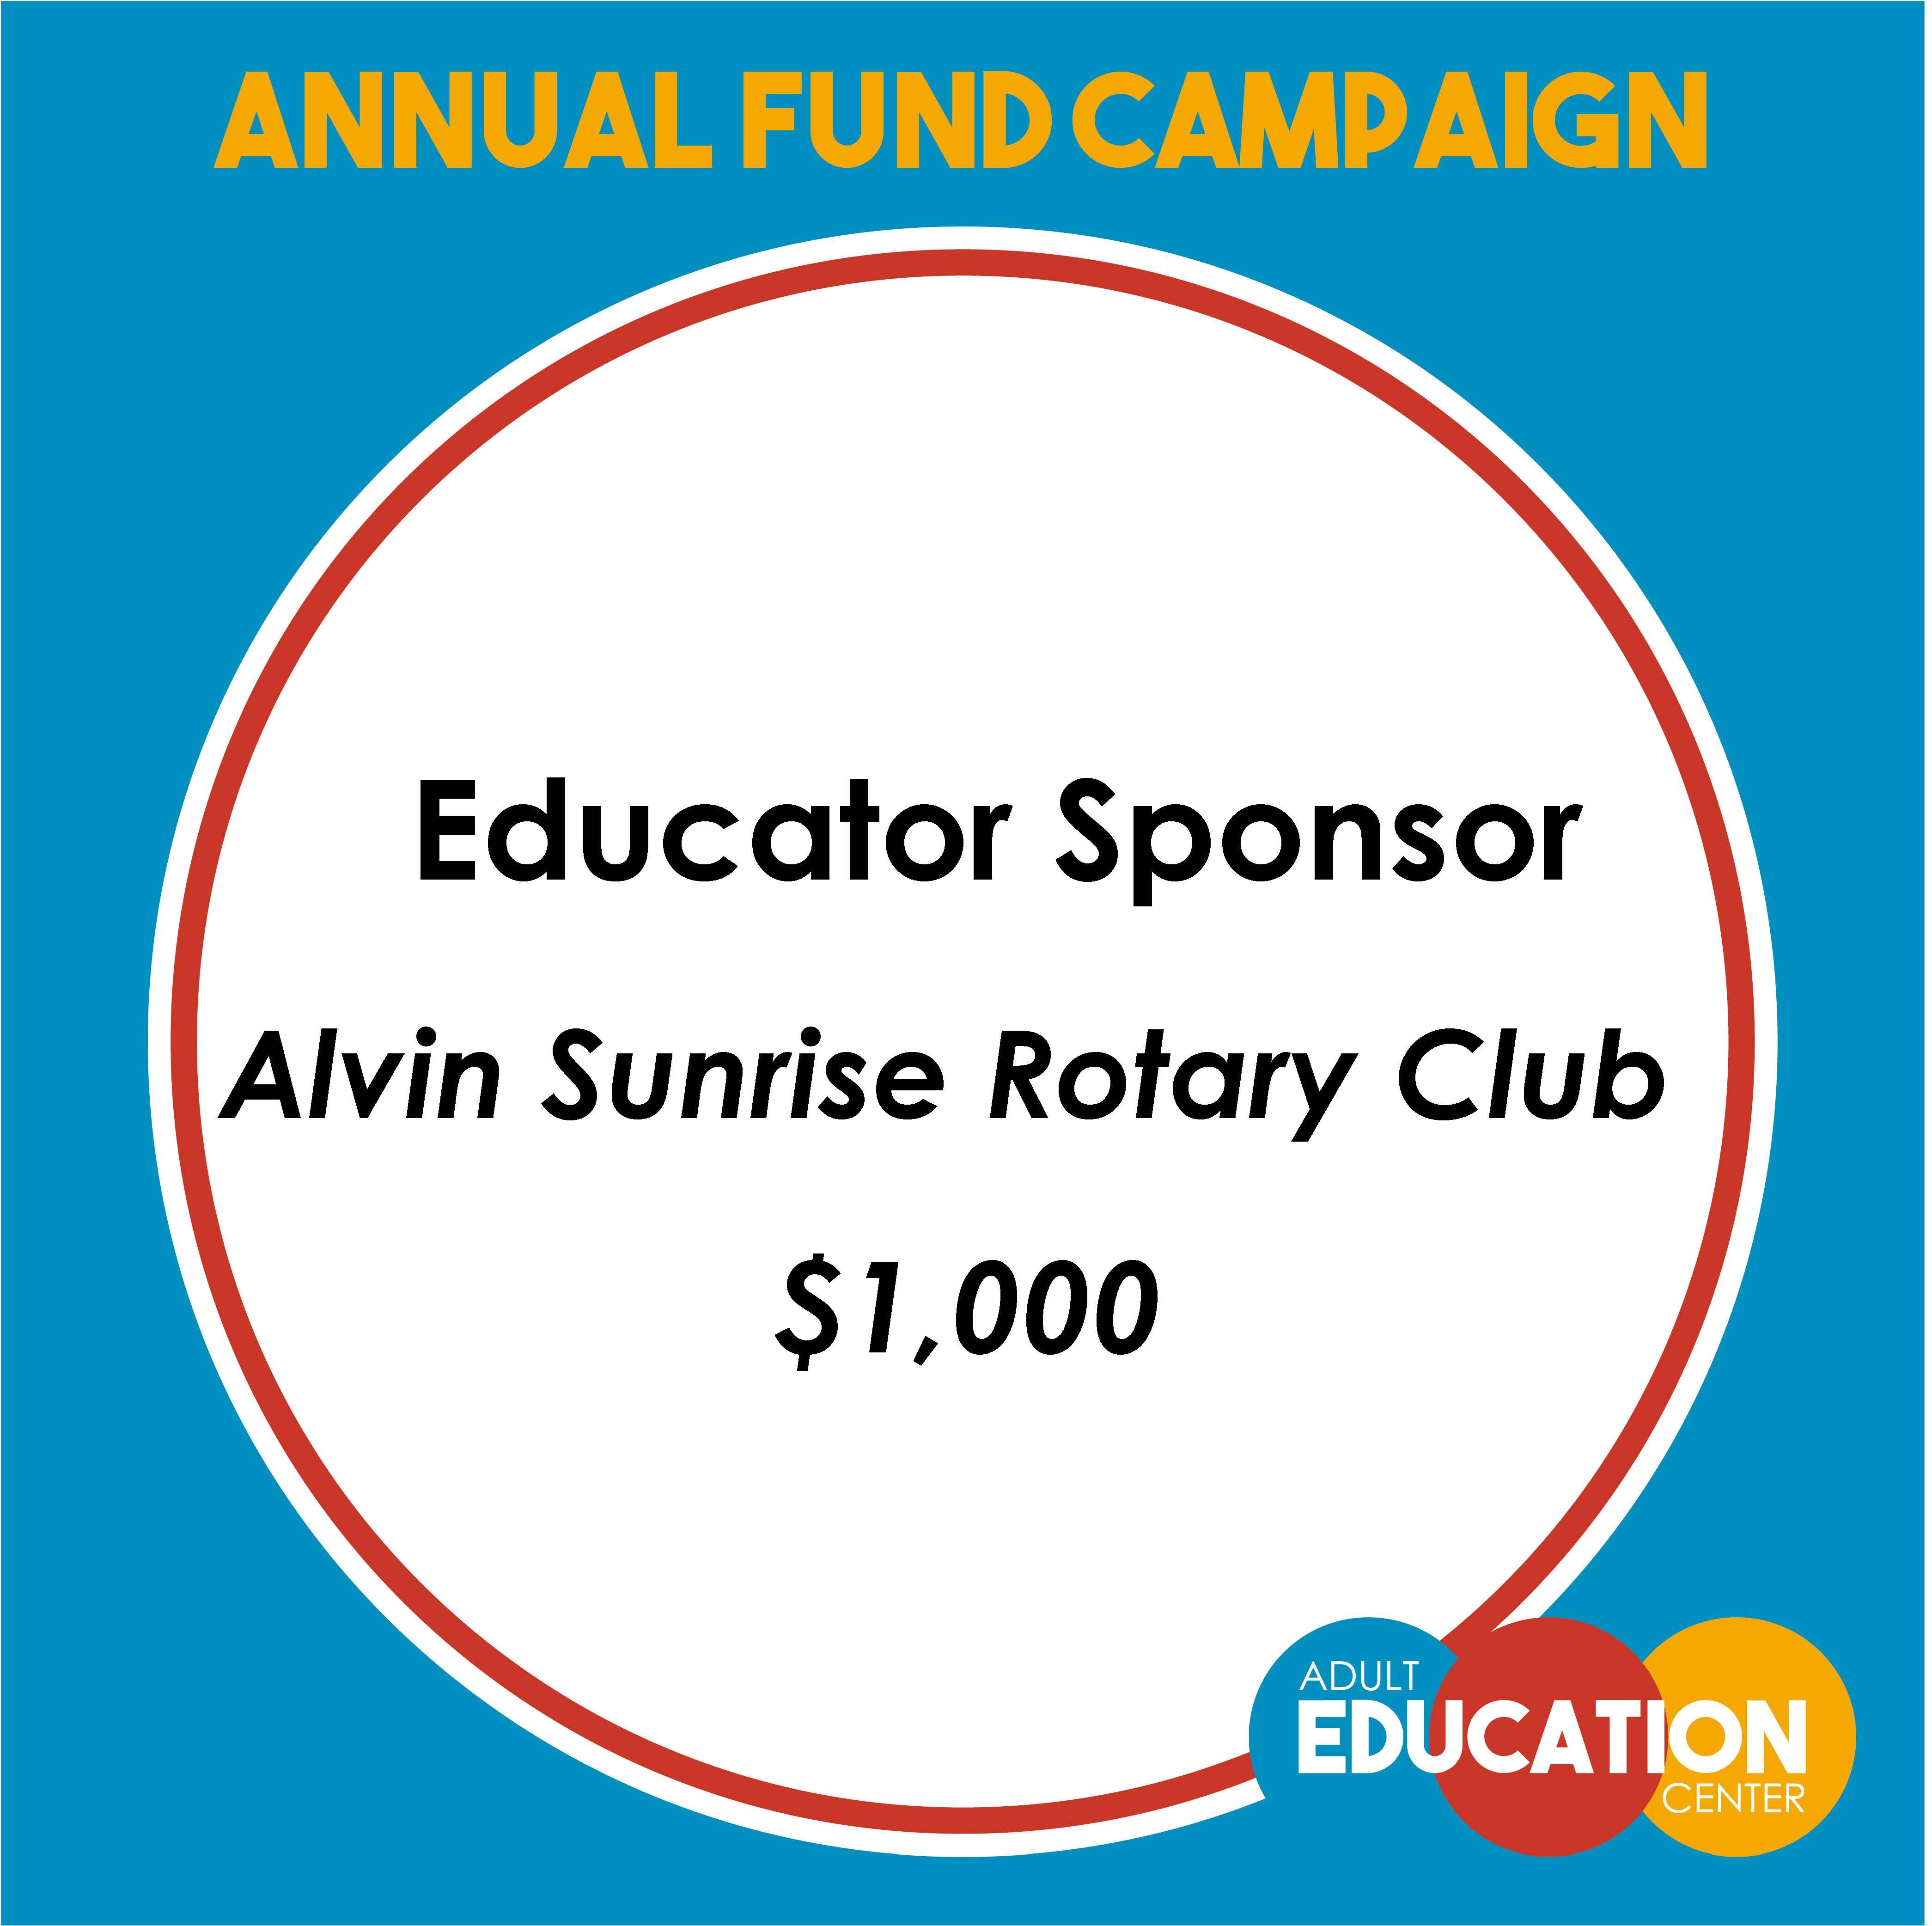 Alvin Sunrise Rotary Club  Educator Sponsor - $1,000